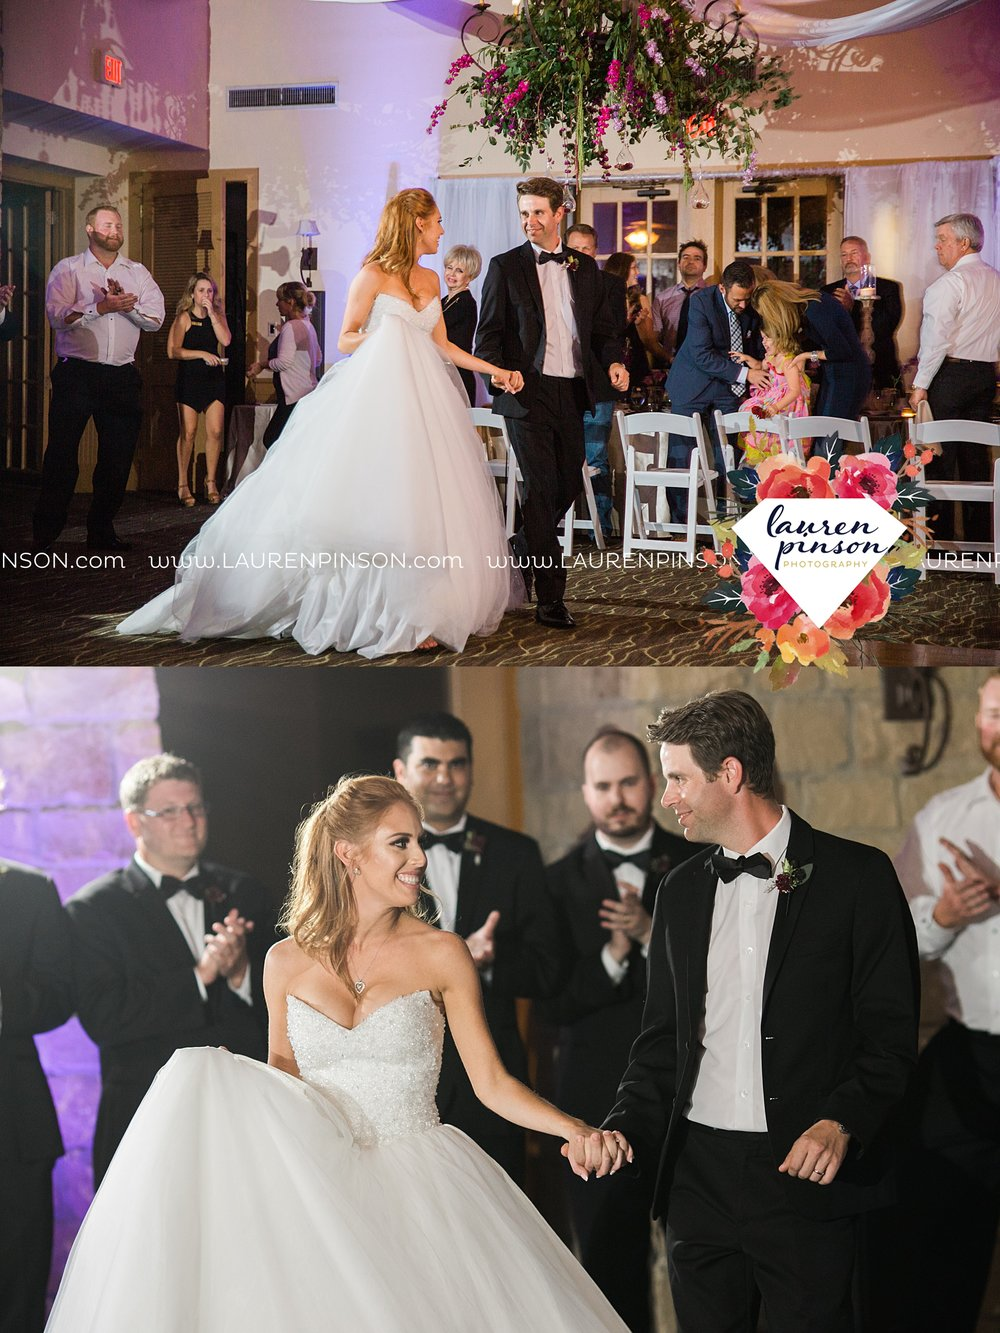 denton-lantana-dfw-texas-wedding-at-lantana-golf-club-country-wedding-by-cocofleur-events-wichita-falls-wedding-photographer_3619.jpg